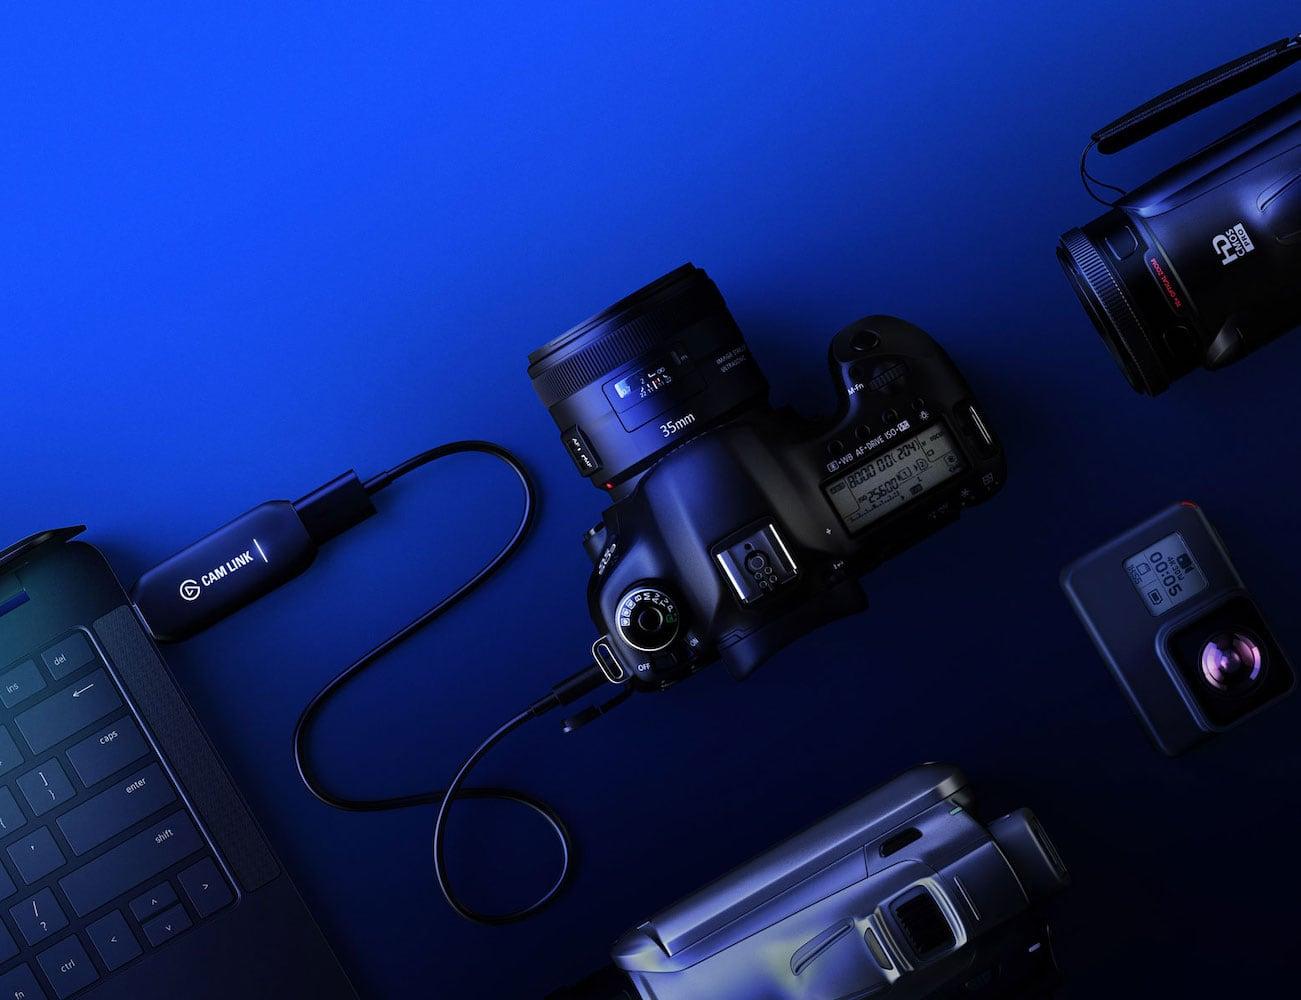 Elgato Cam Link 4 Compact HDMI Capture Device